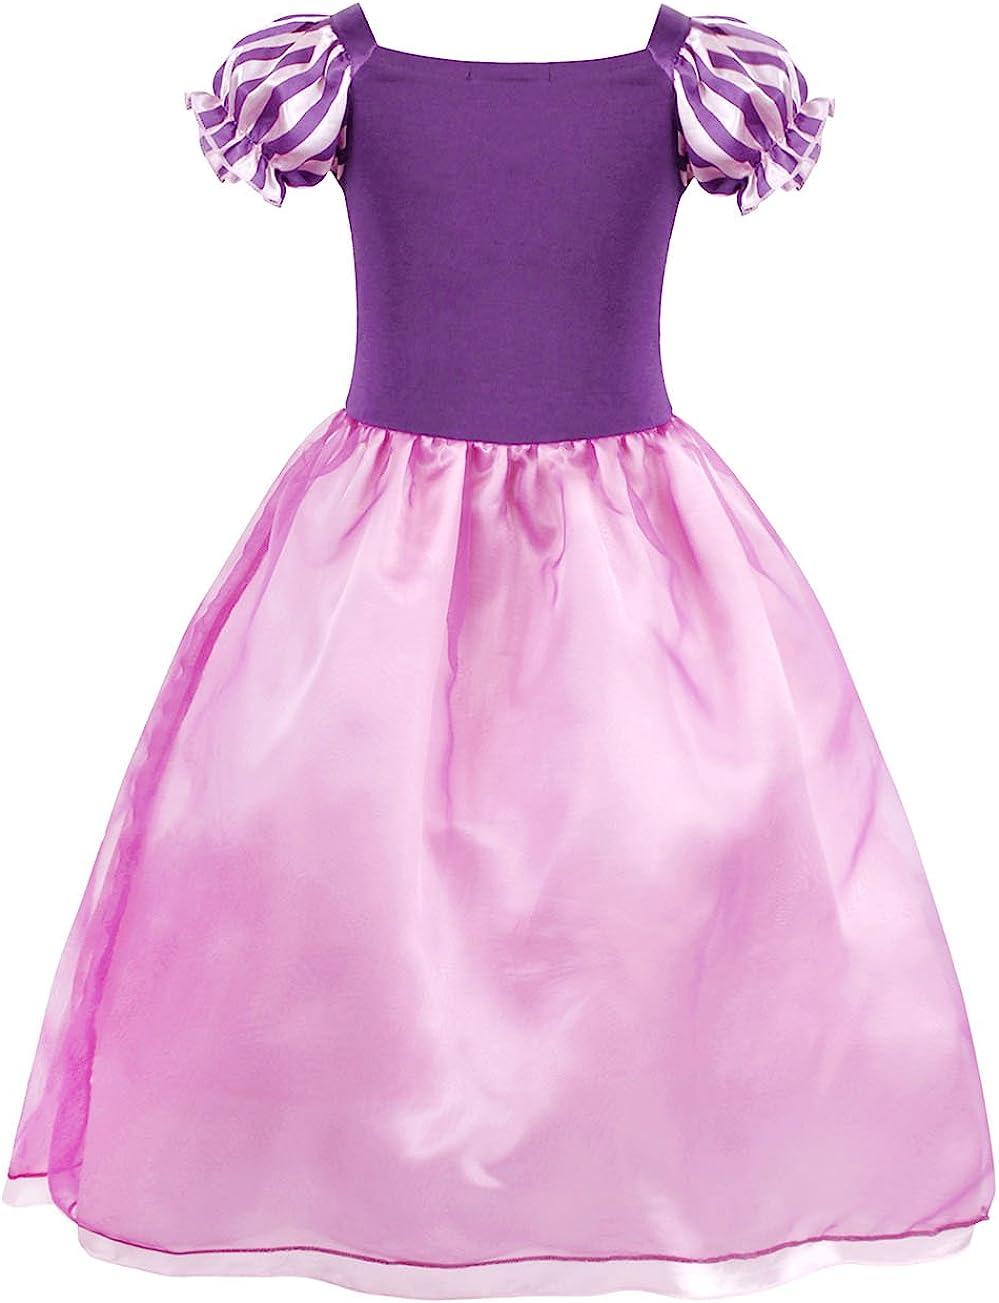 Cotrio Princess Dresses Girls Costumes Dress Up Accessories Set